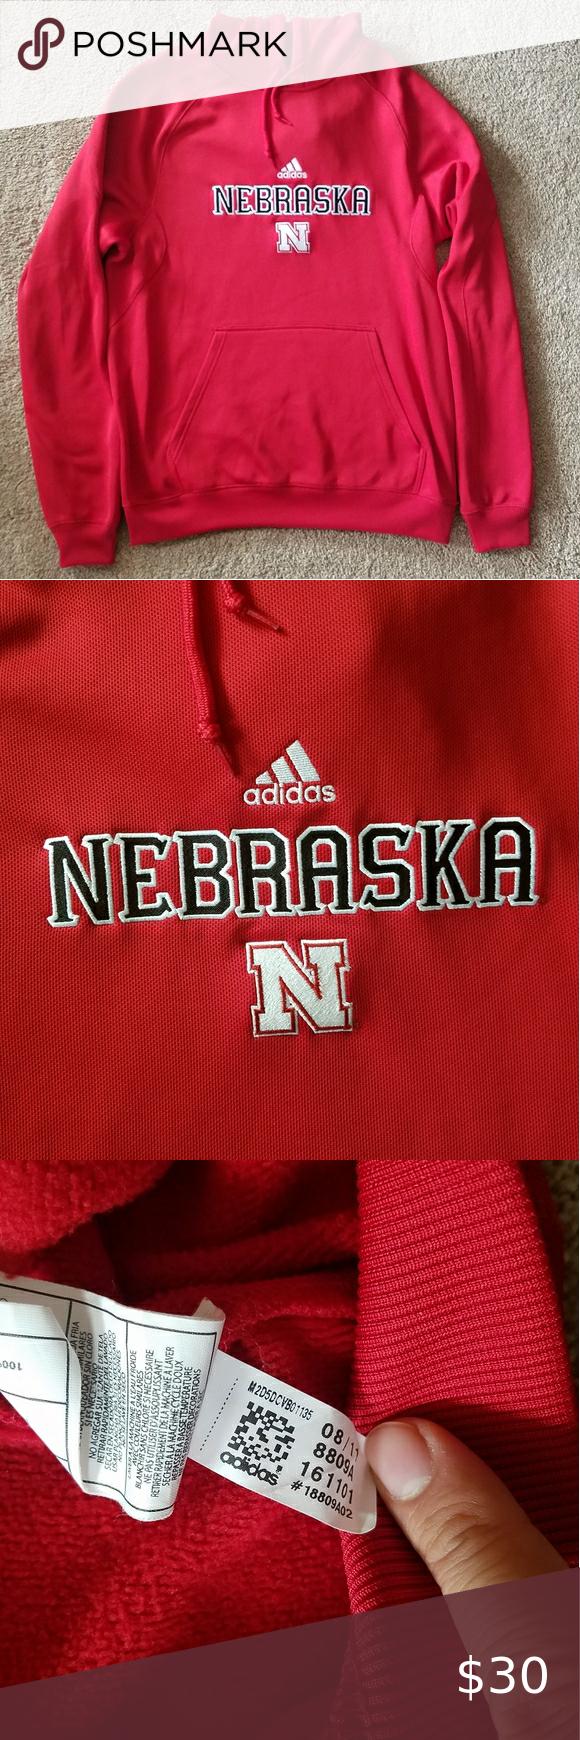 Adidas Nebraska Cornhuskers Climawarm Hoodie Sweatshirt Shirt Sweatshirts Adidas Shirt [ 1740 x 580 Pixel ]